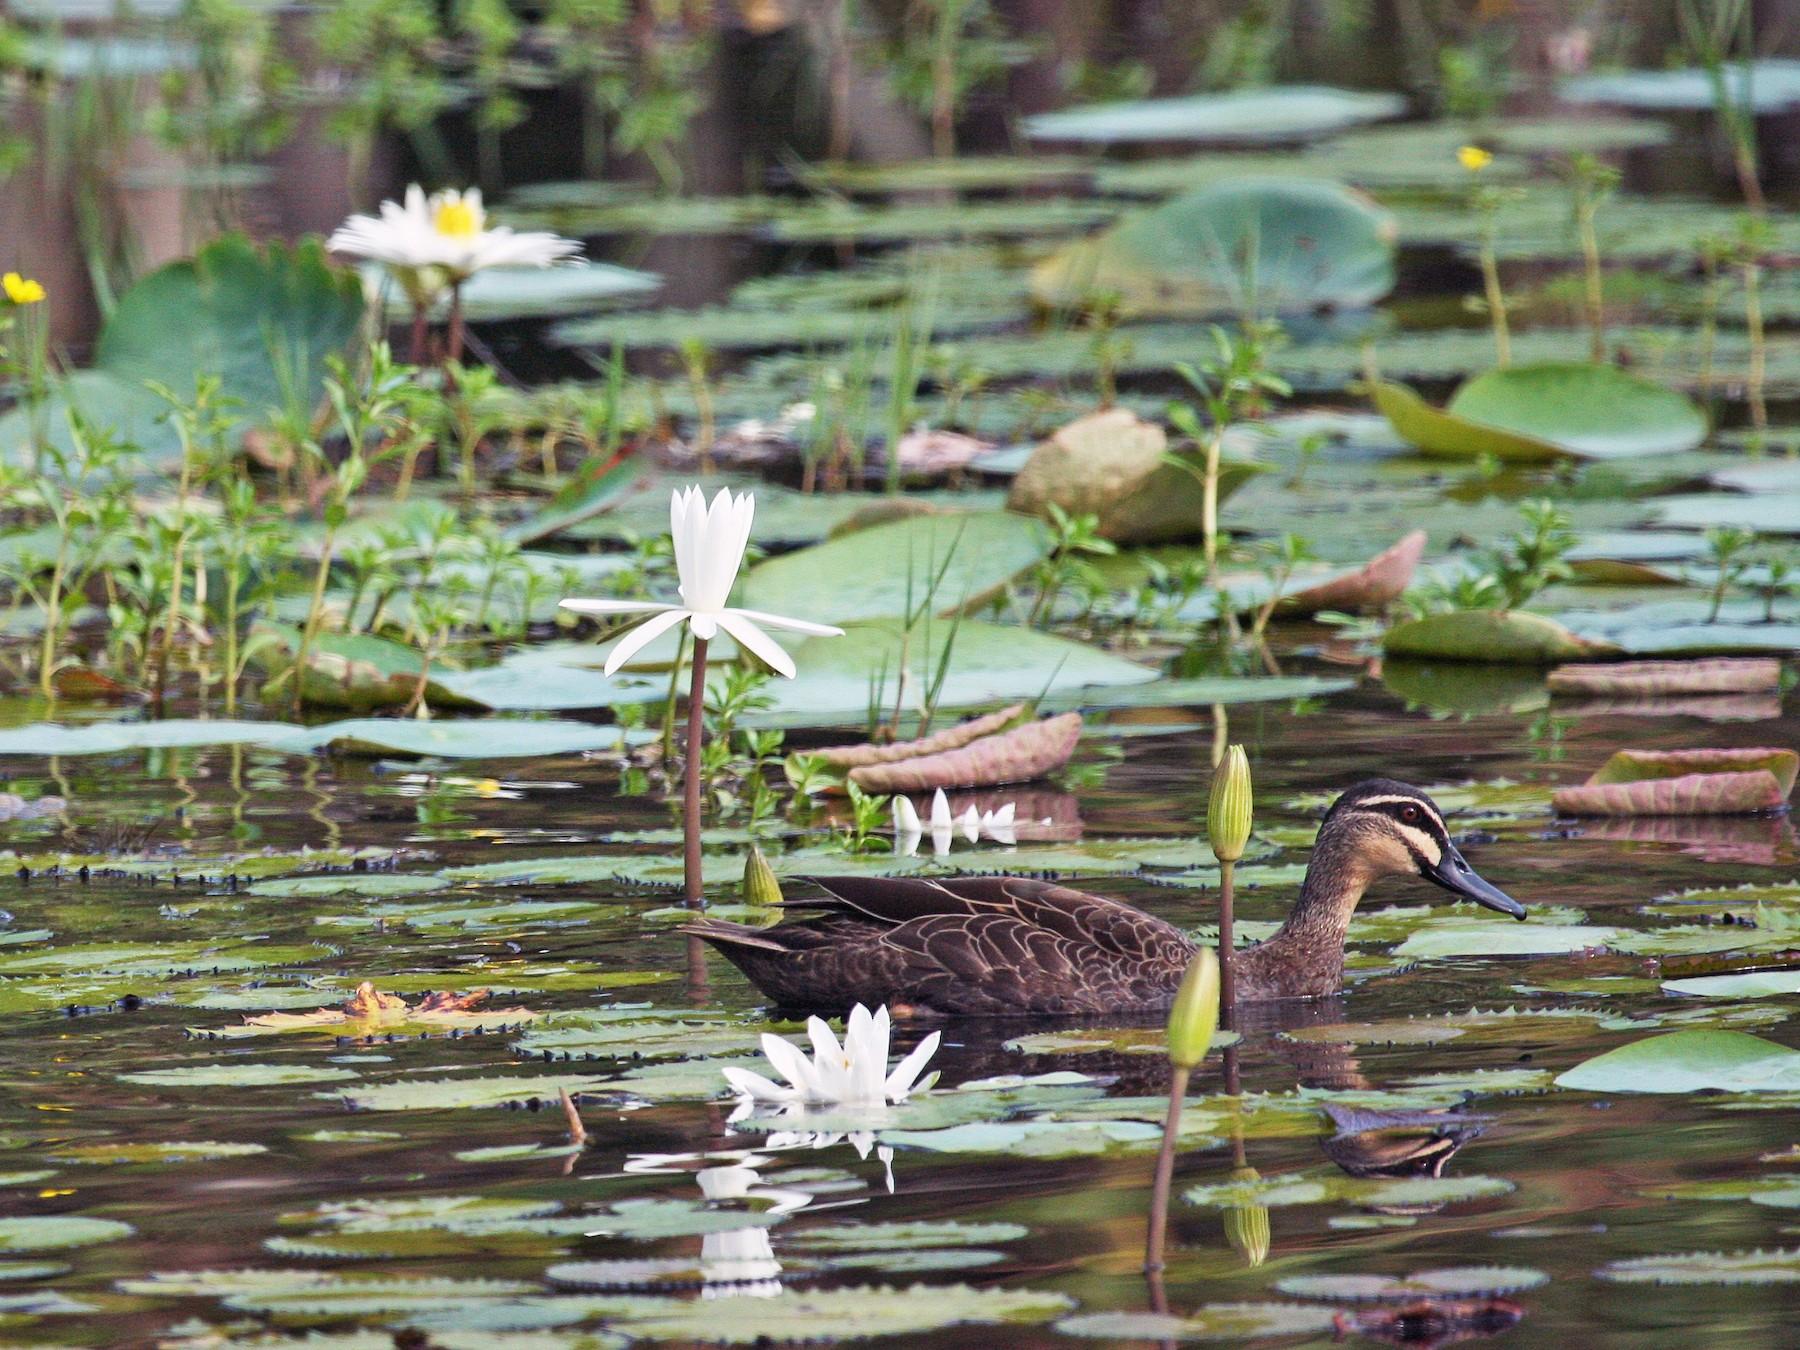 Pacific Black Duck - Tim Lenz